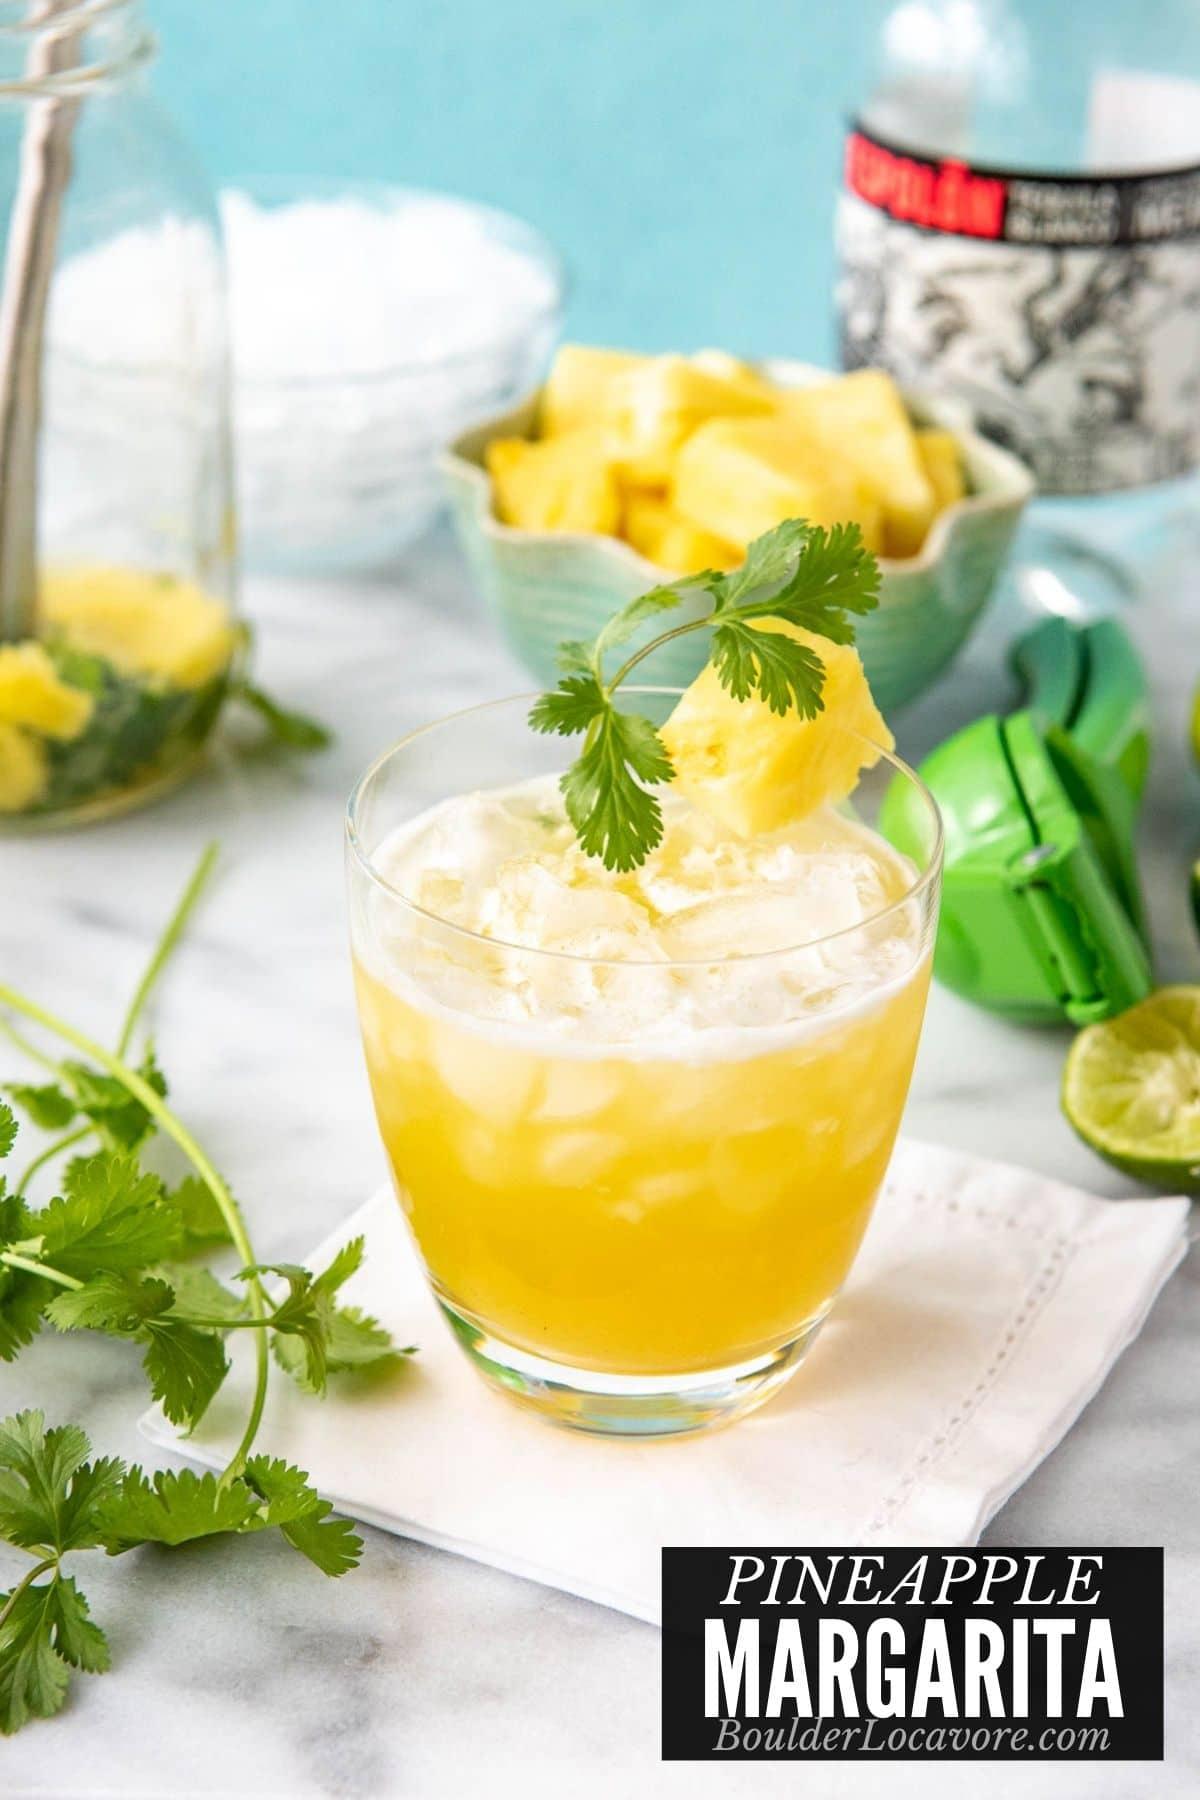 Pineapple Margarita title